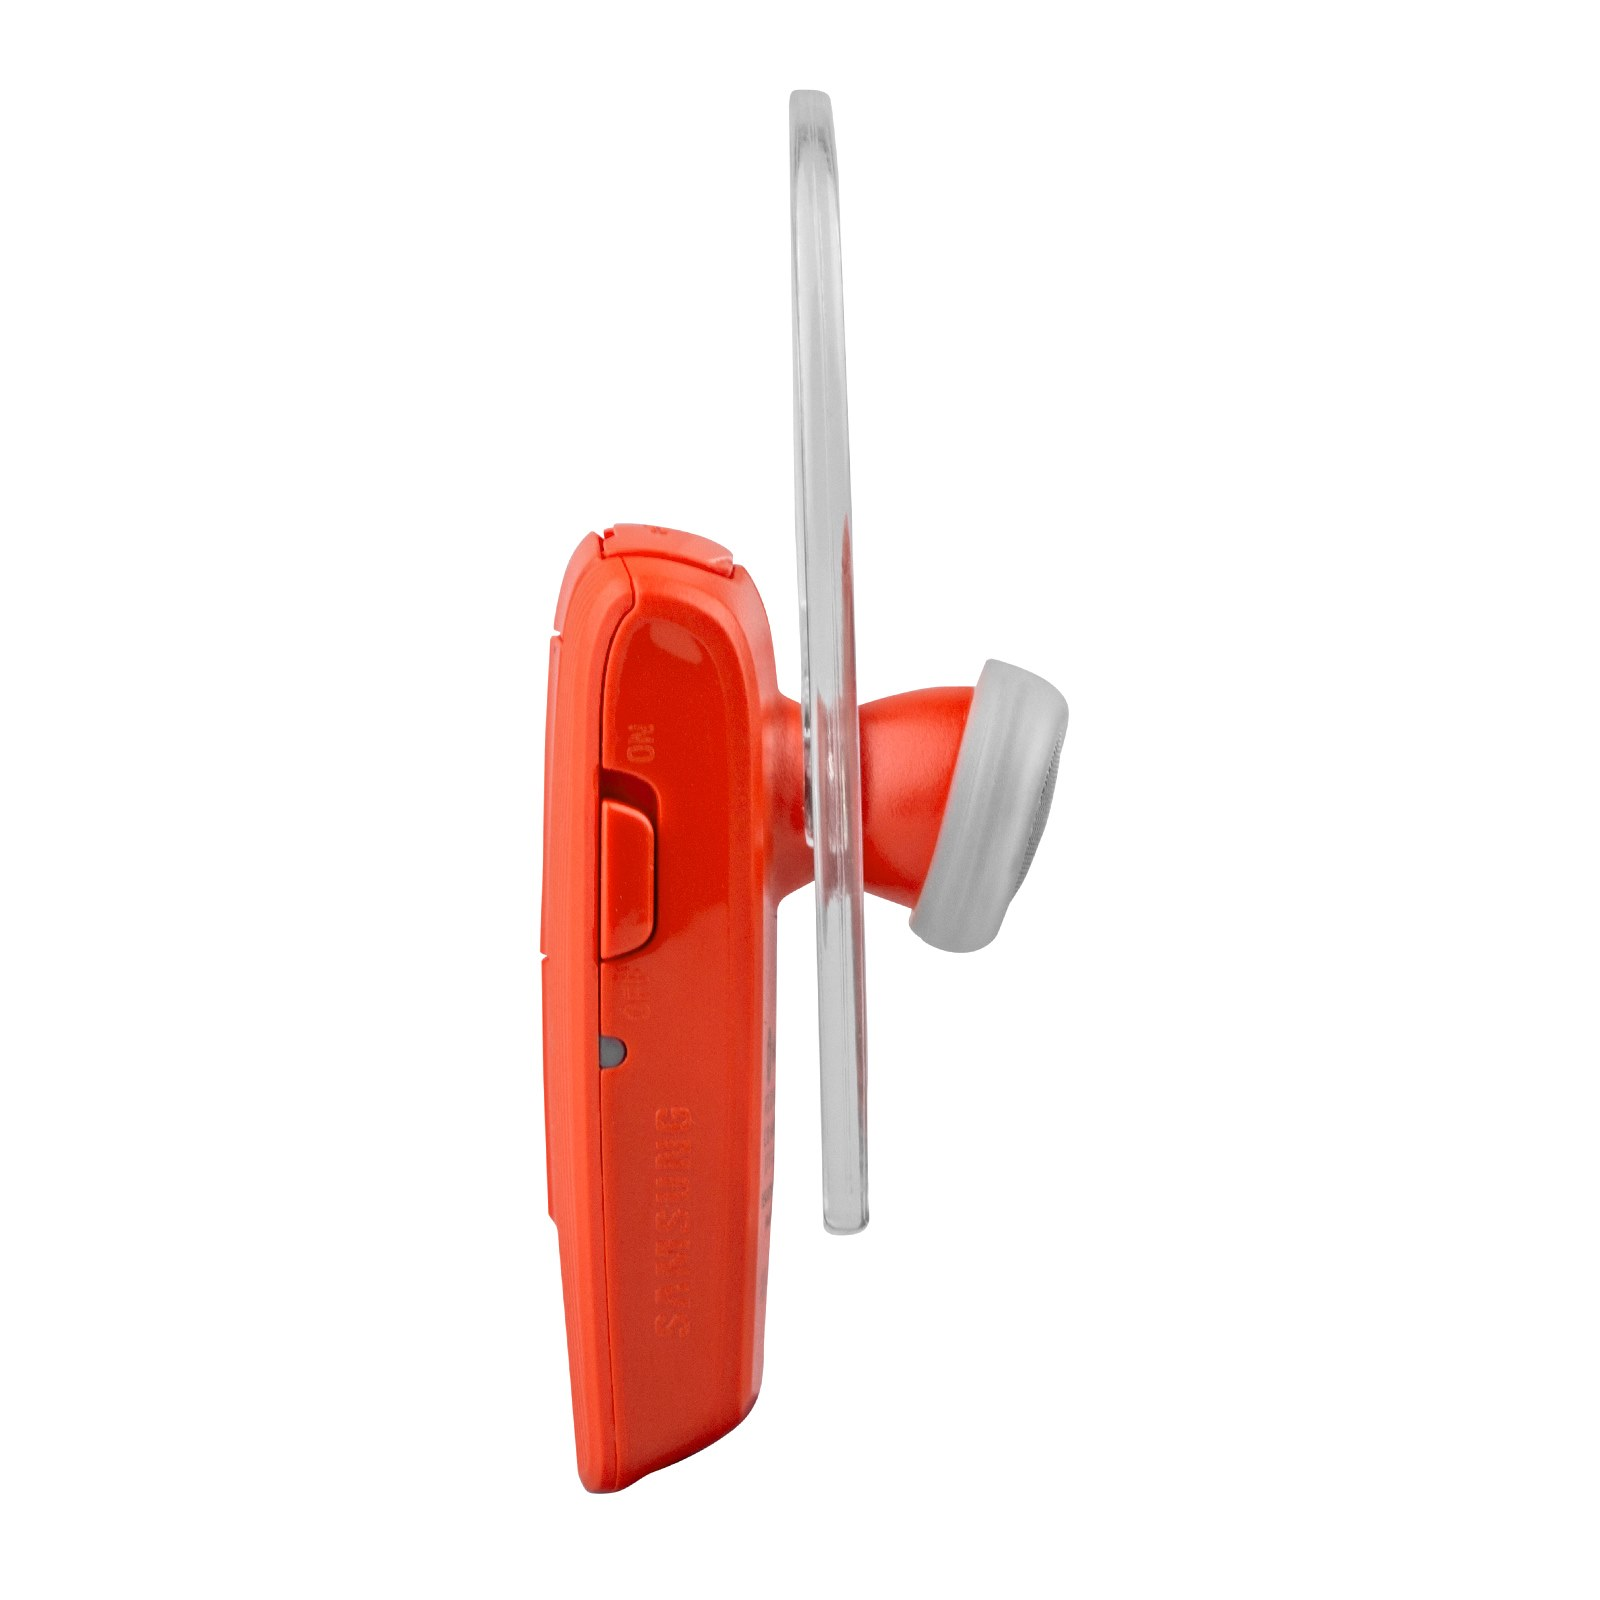 Bluetooth Wireless Headset Over Ear: Samsung HM1300 Over-Ear Wireless Bluetooth Headset